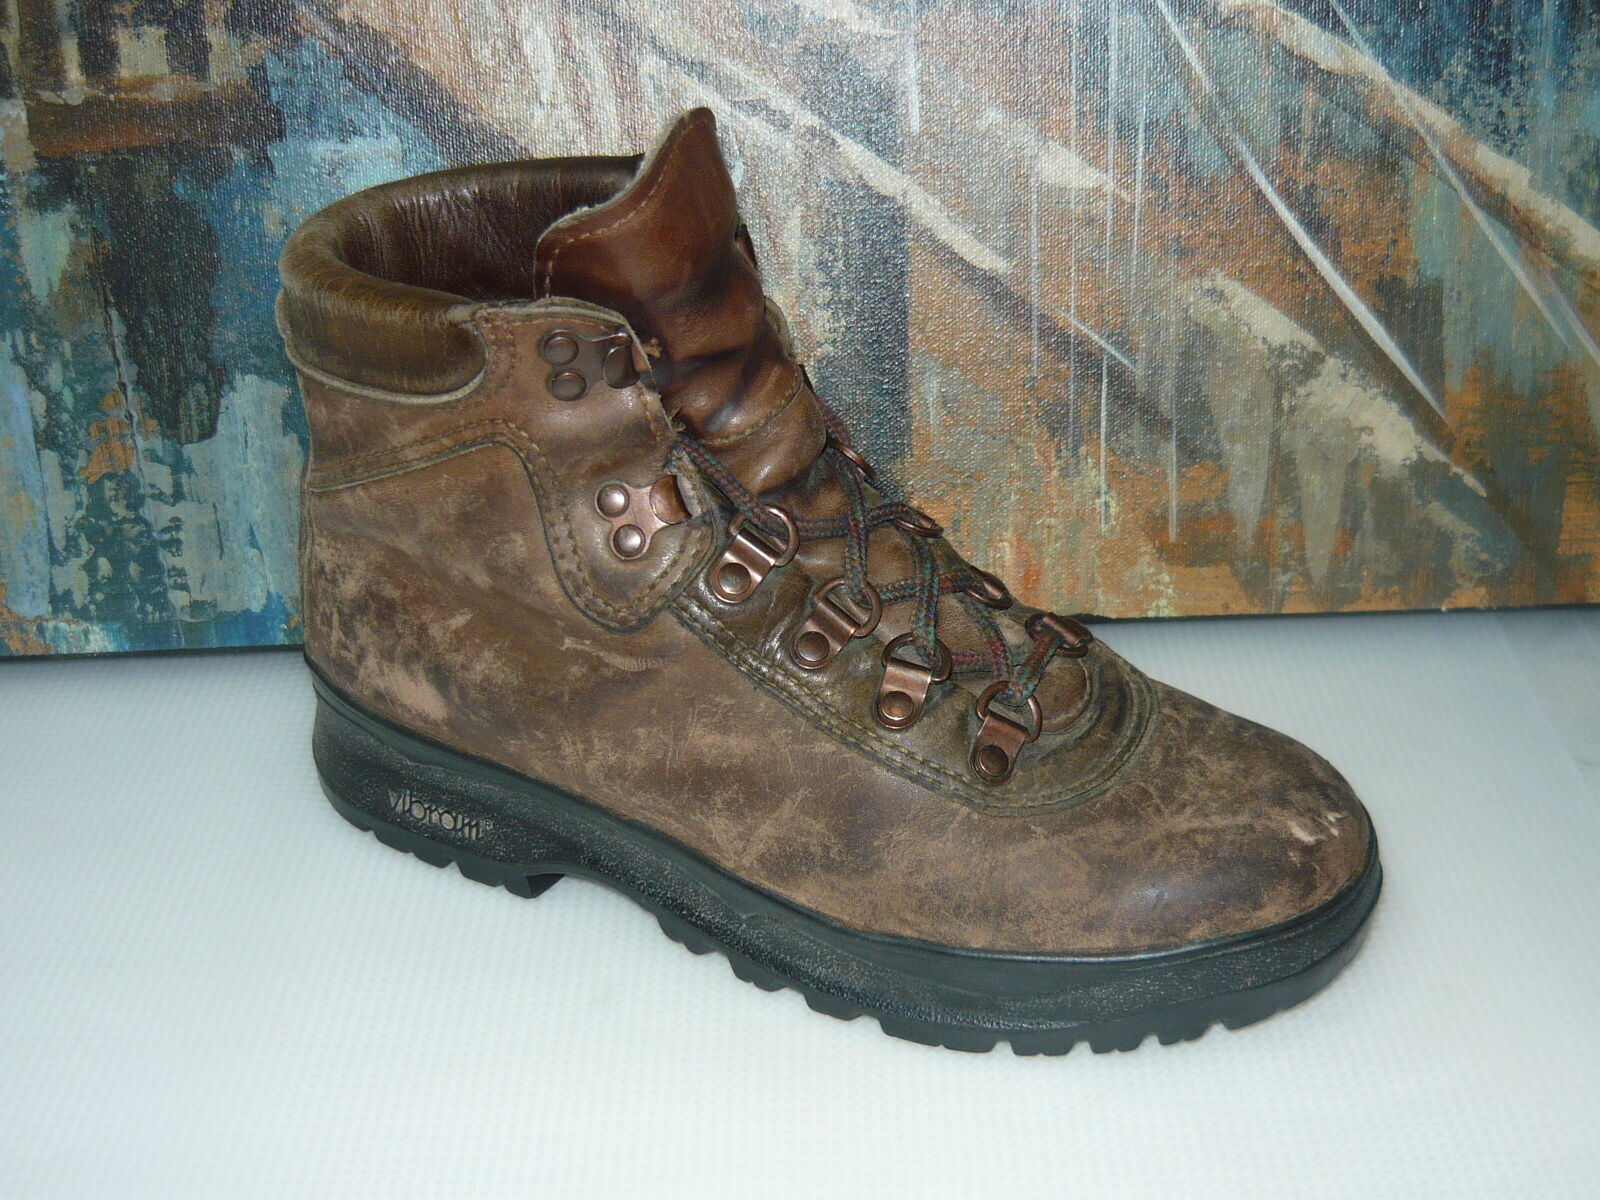 Danner bspringaaa läder & Gore Tex Fabric Eddie Bauer Hiking stövlar kvinnor S8.5M